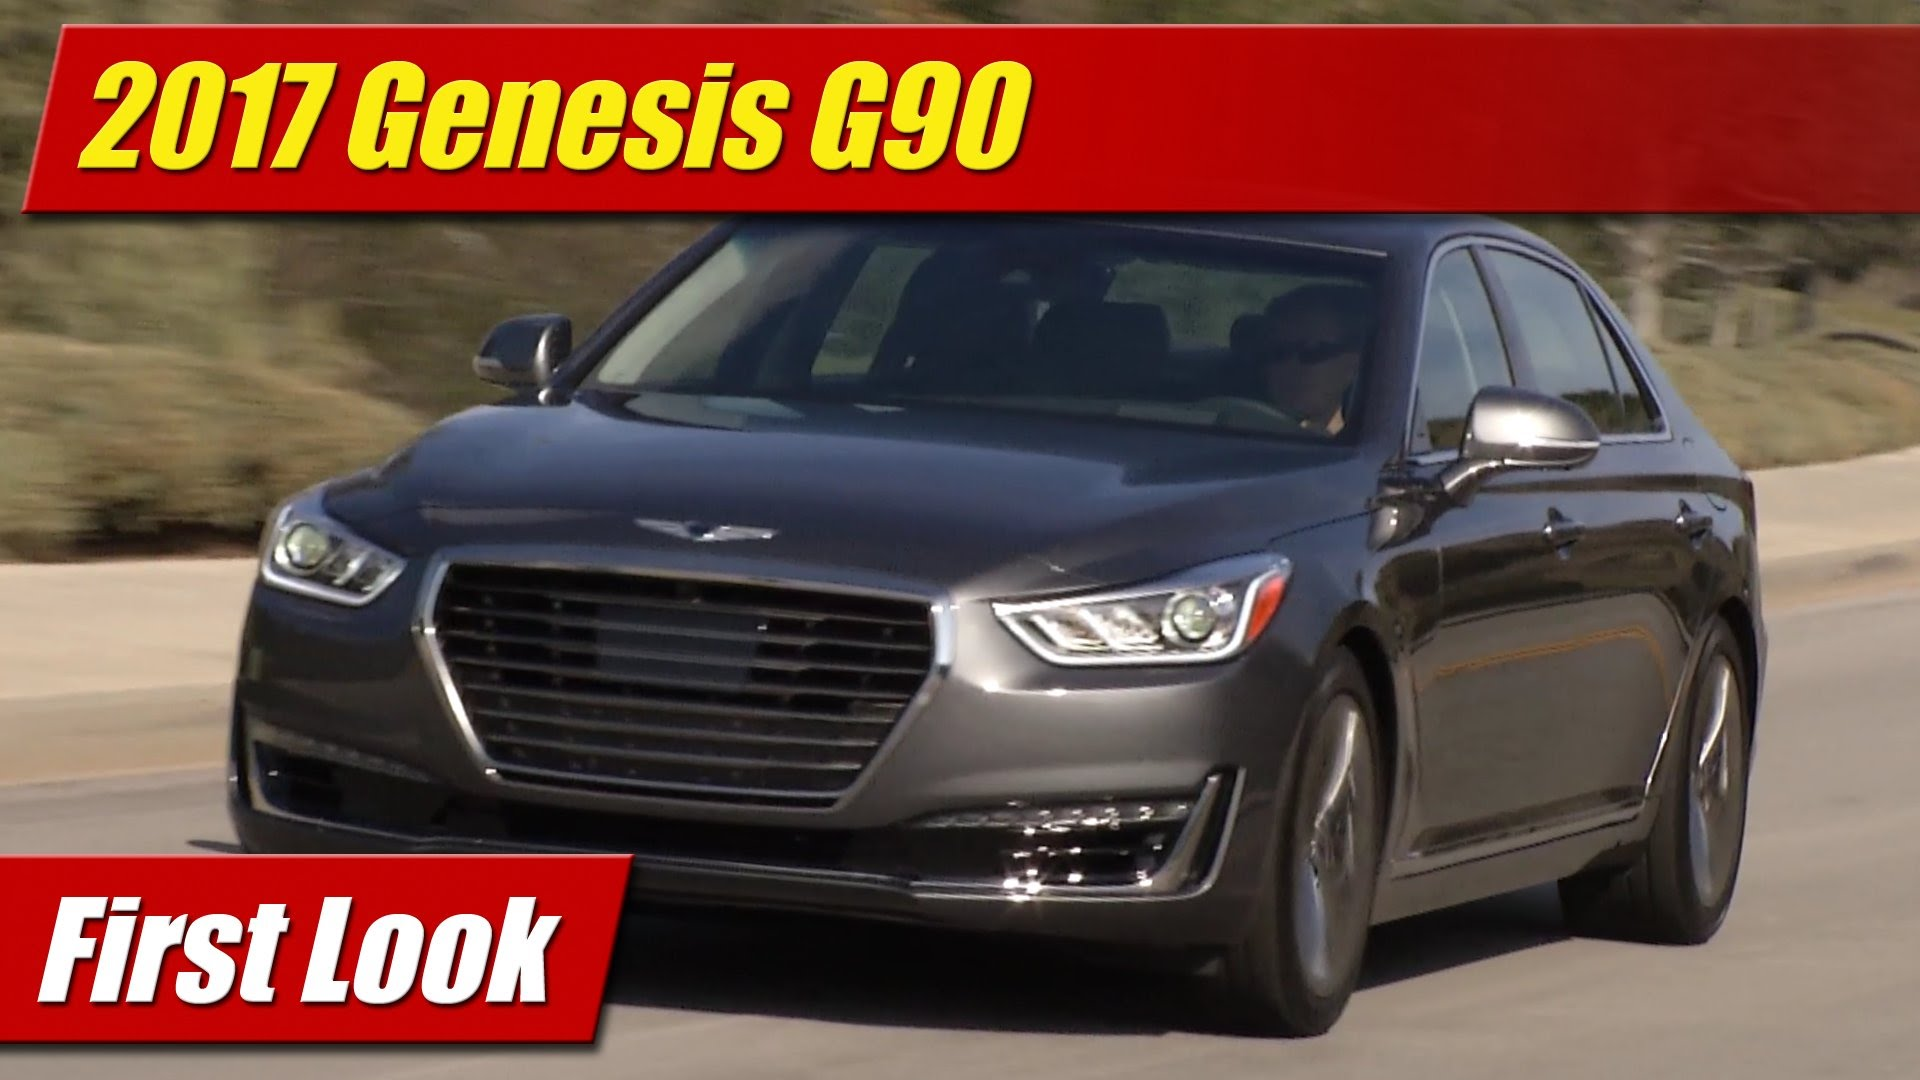 Fantastic First Look 2017 Genesis G90  TestDrivenTV